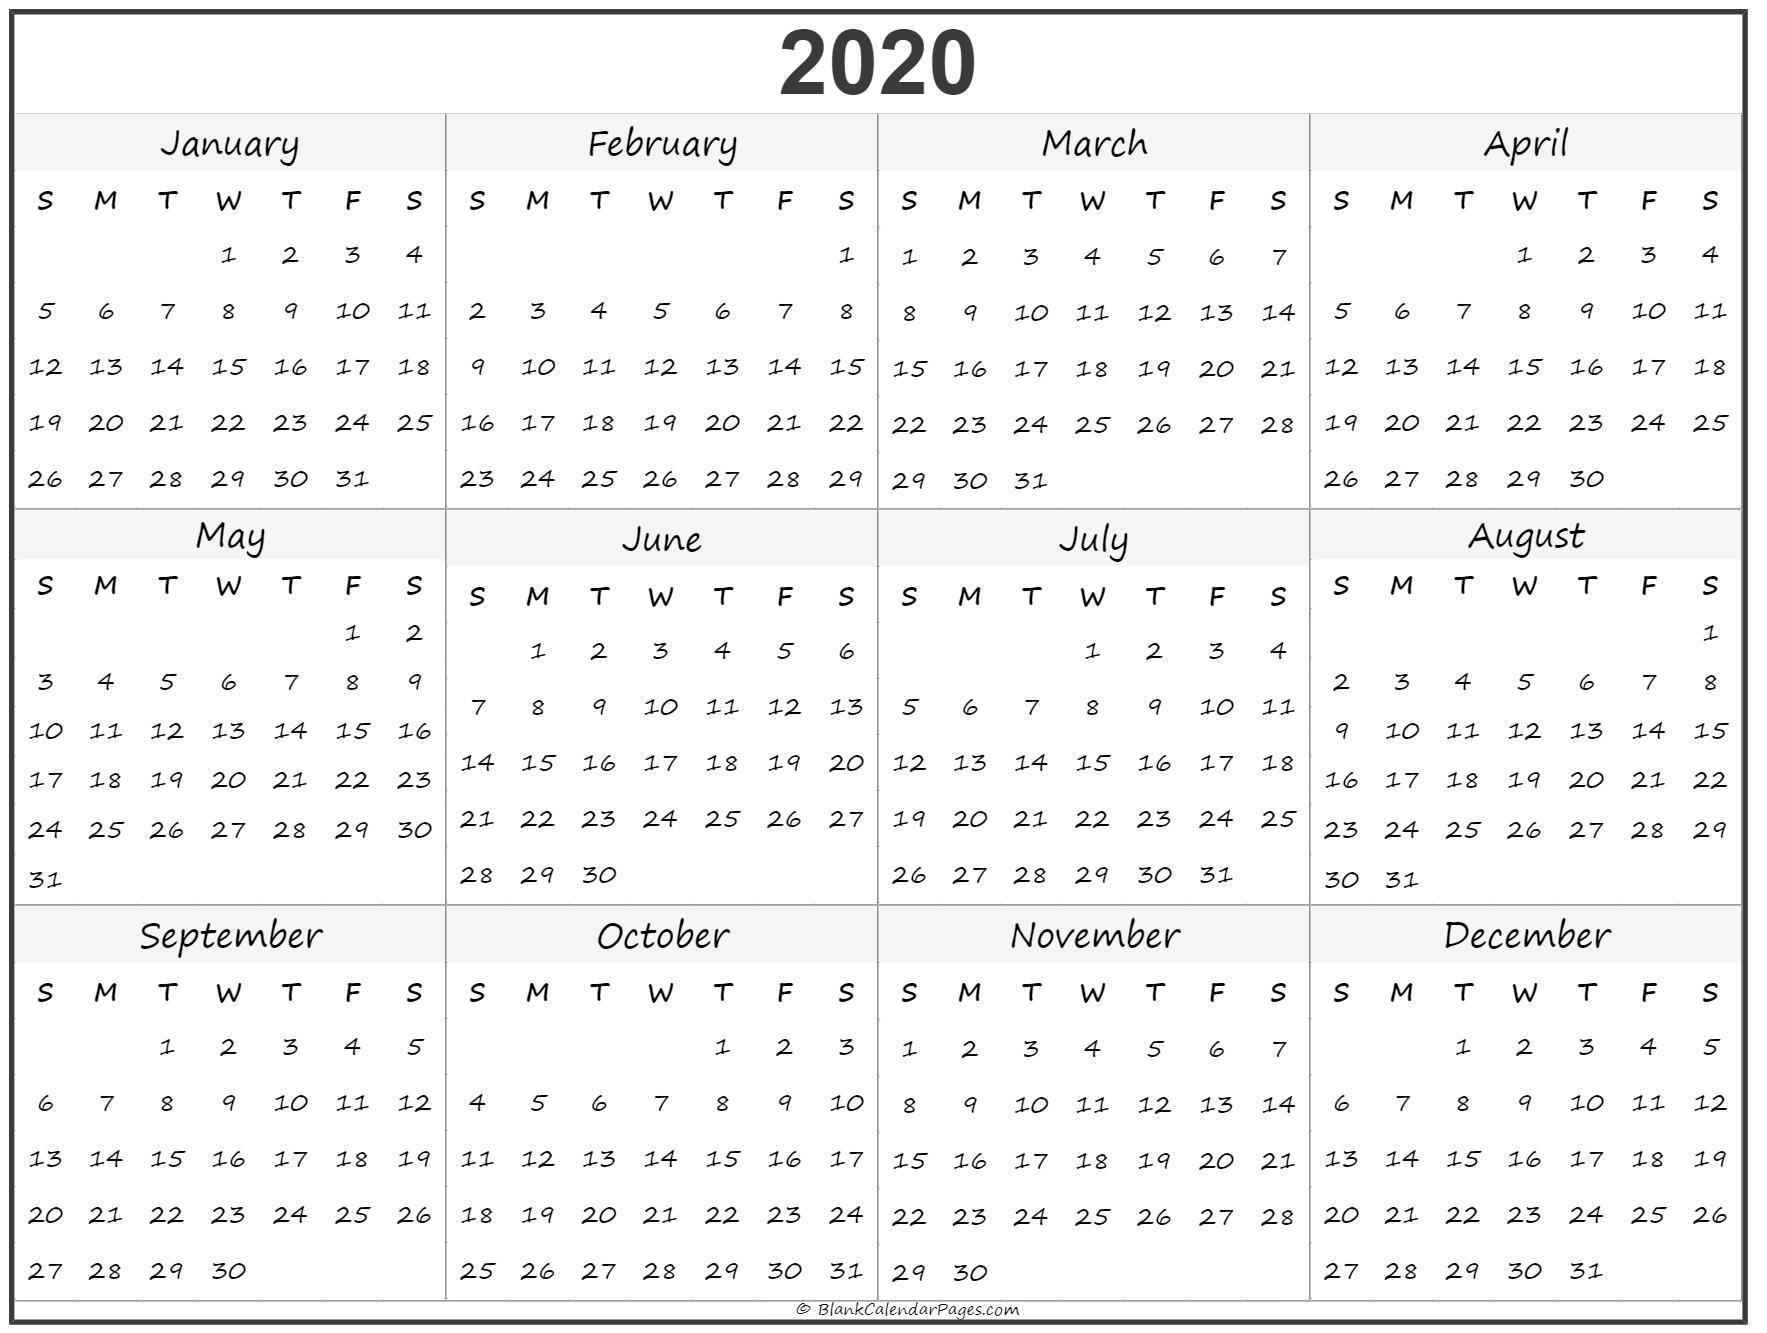 2020 Calendar Whole Year